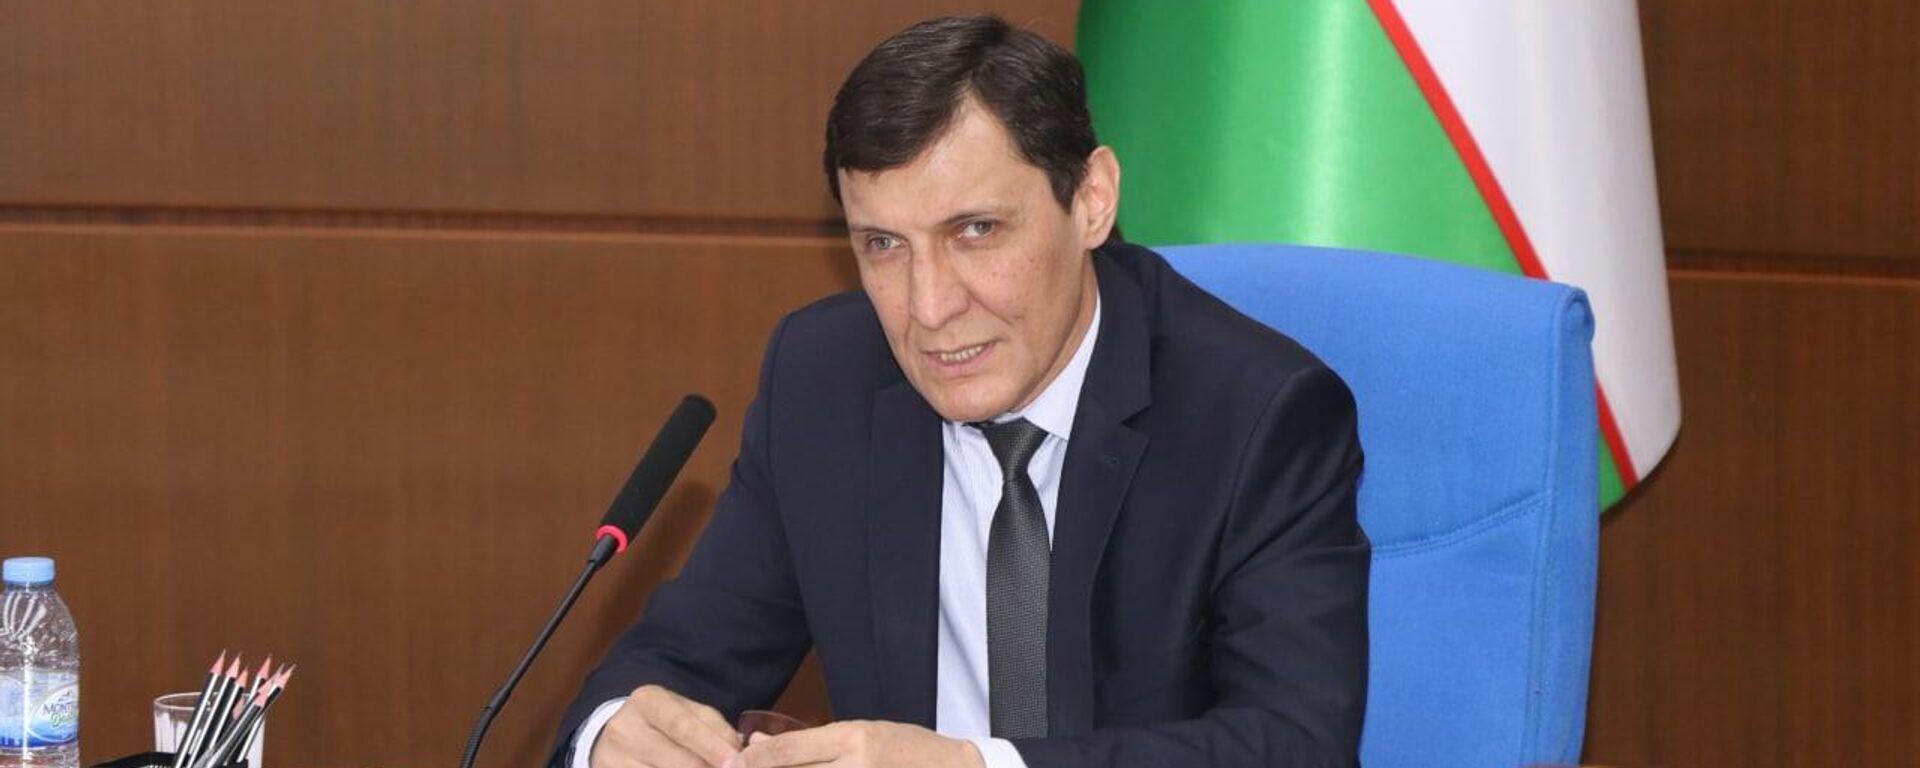 Директор Центра народной дипломатии ШОС в Узбекистане Кабулжон Сабиров - Sputnik Узбекистан, 1920, 15.06.2021